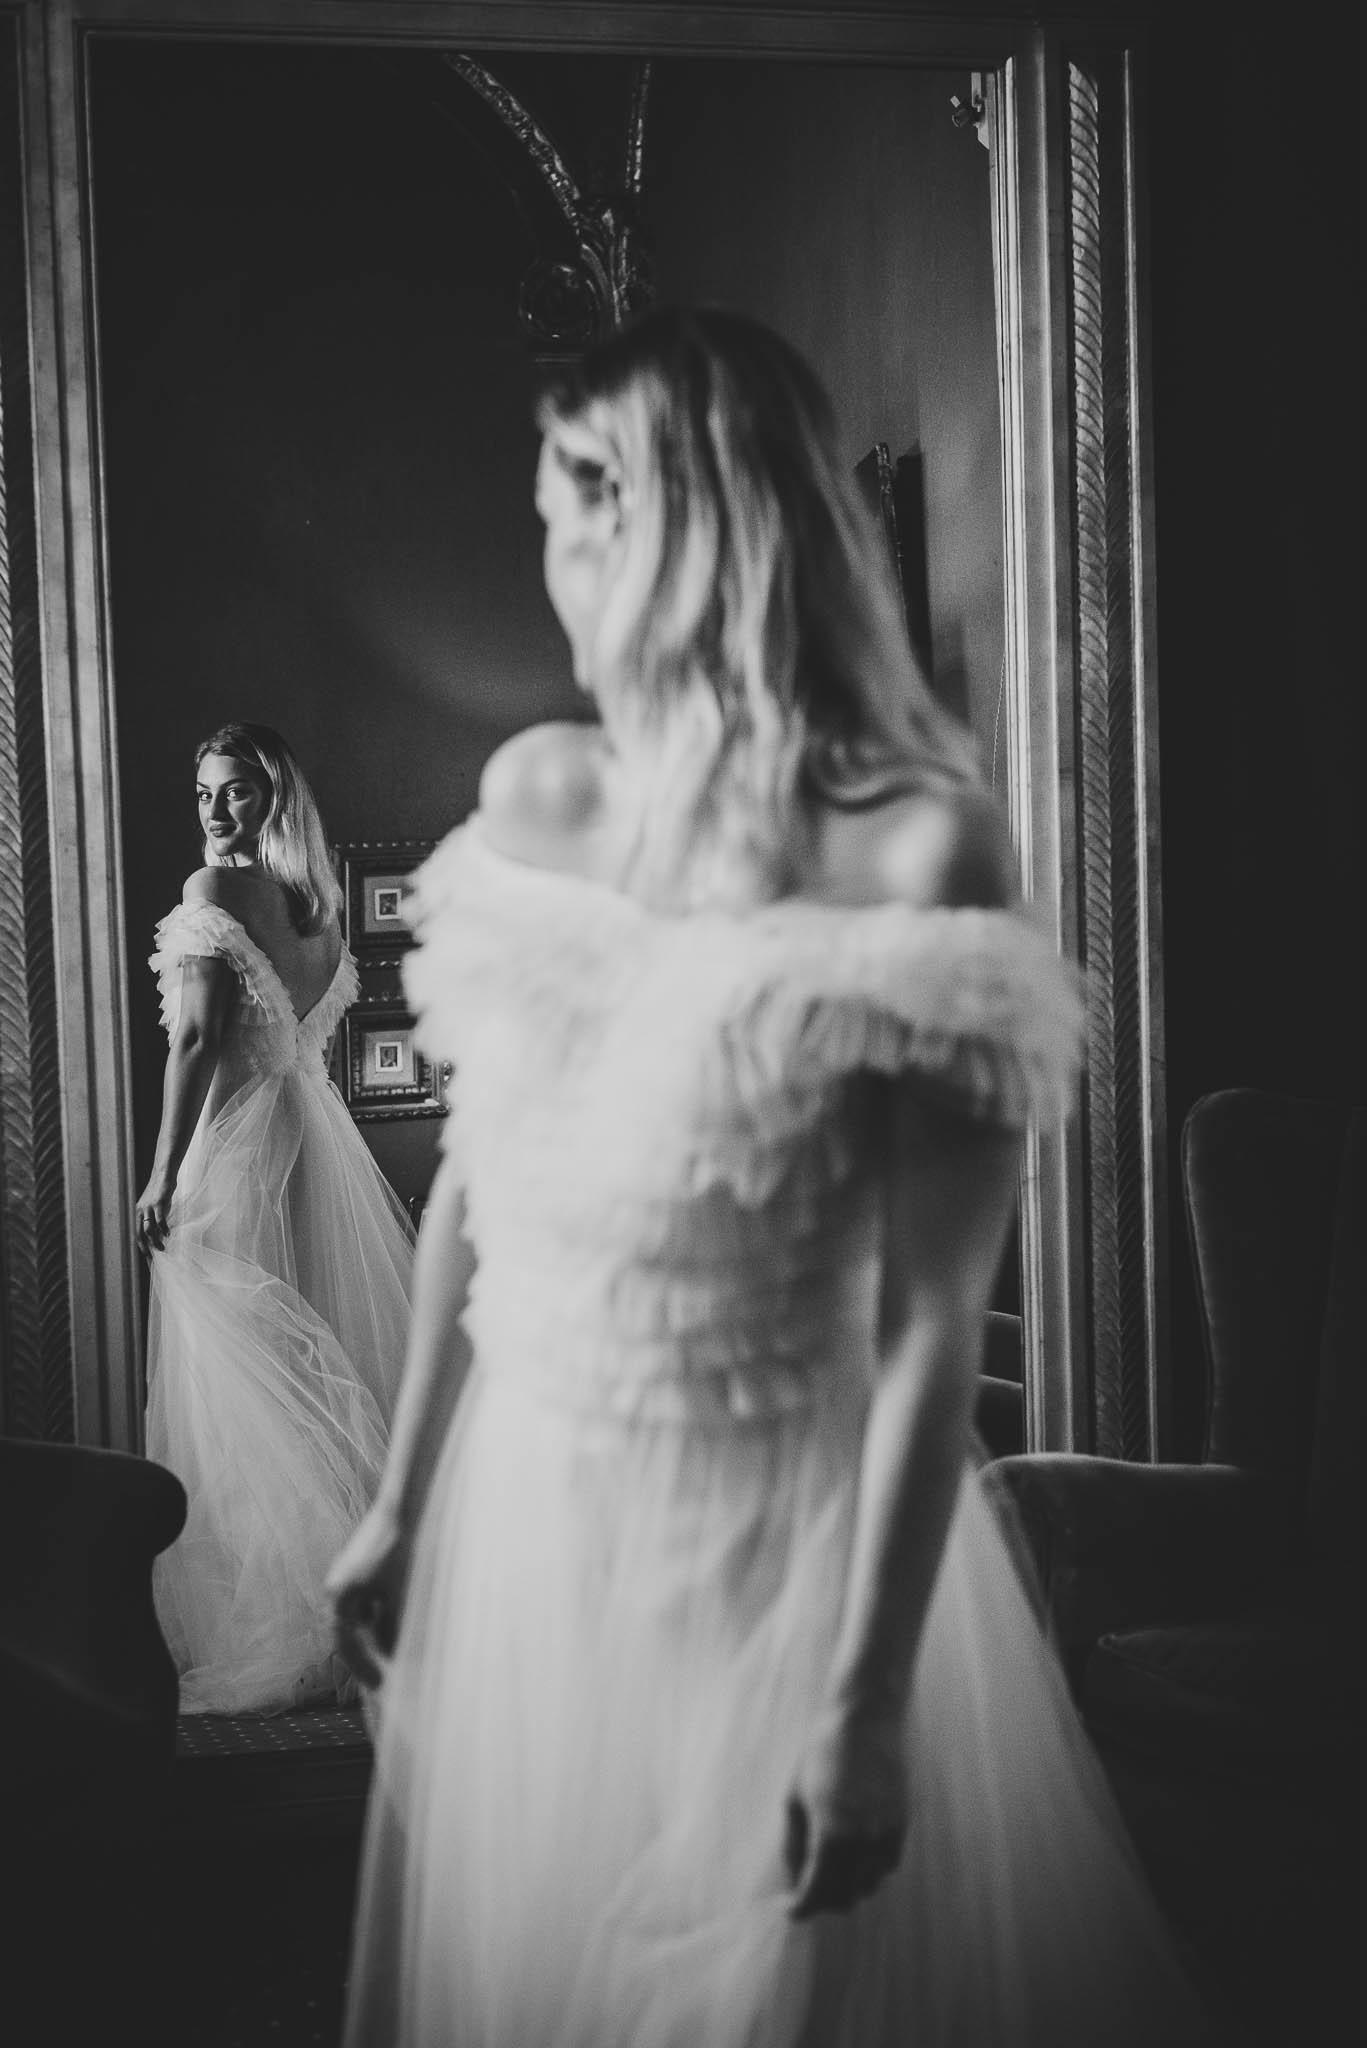 Fashion shooting per Atelier Ricci Lucca